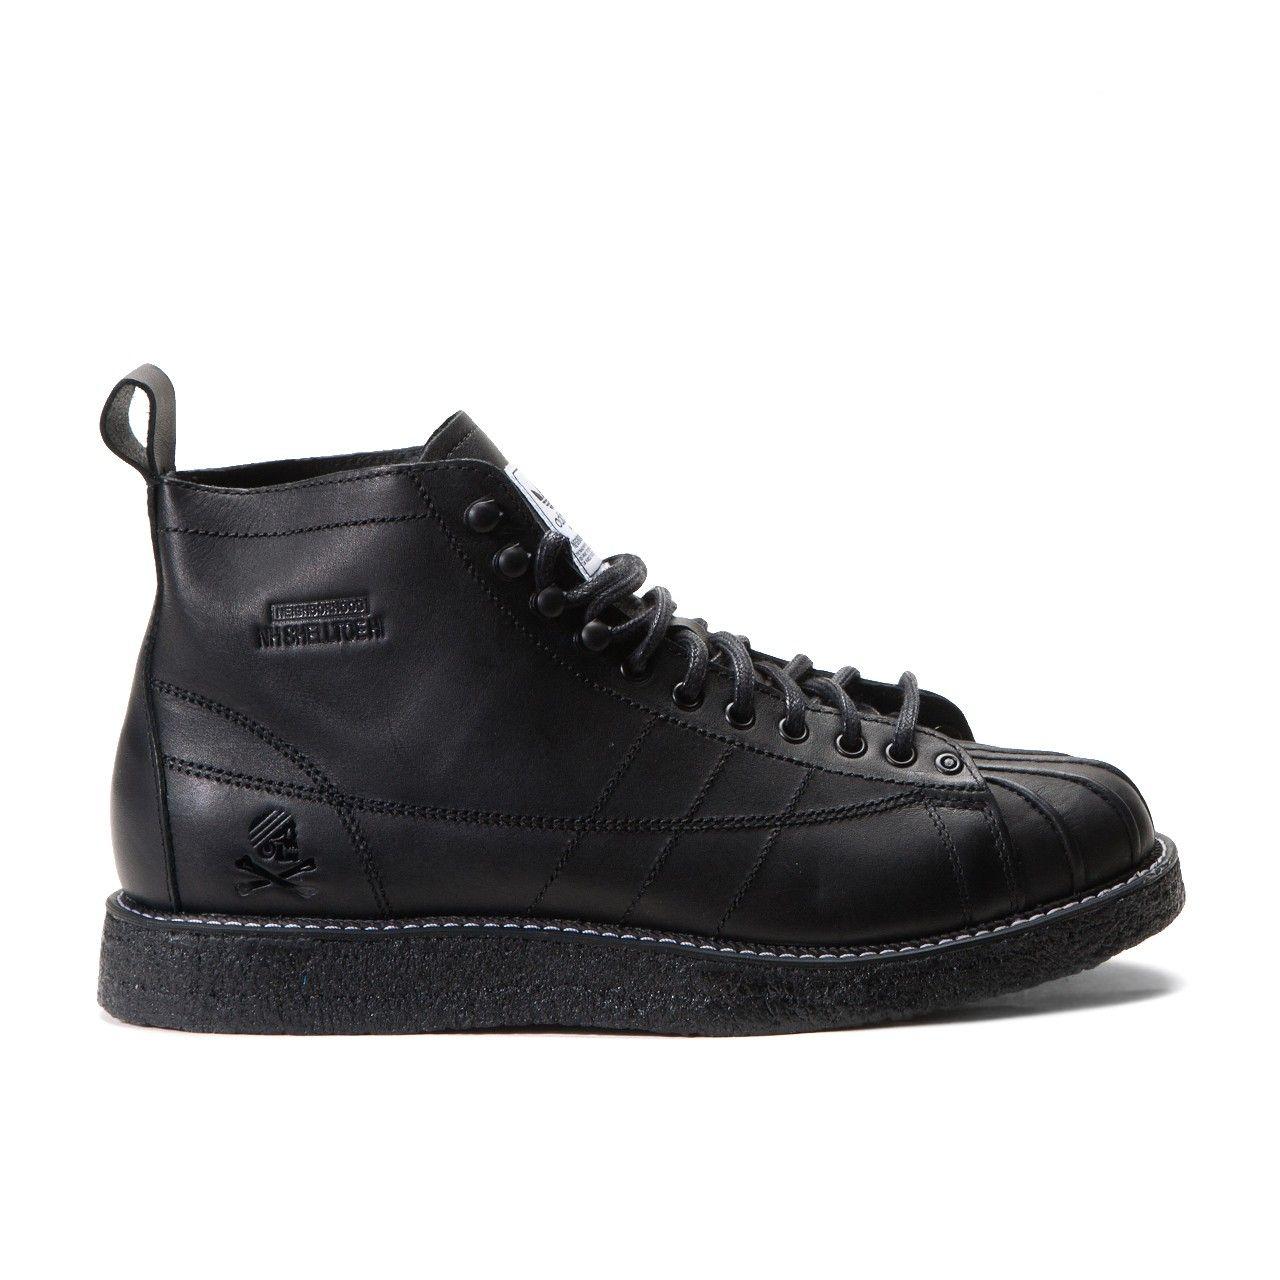 adidas-neighborhood-nh-shelltoe-boots-triple-black